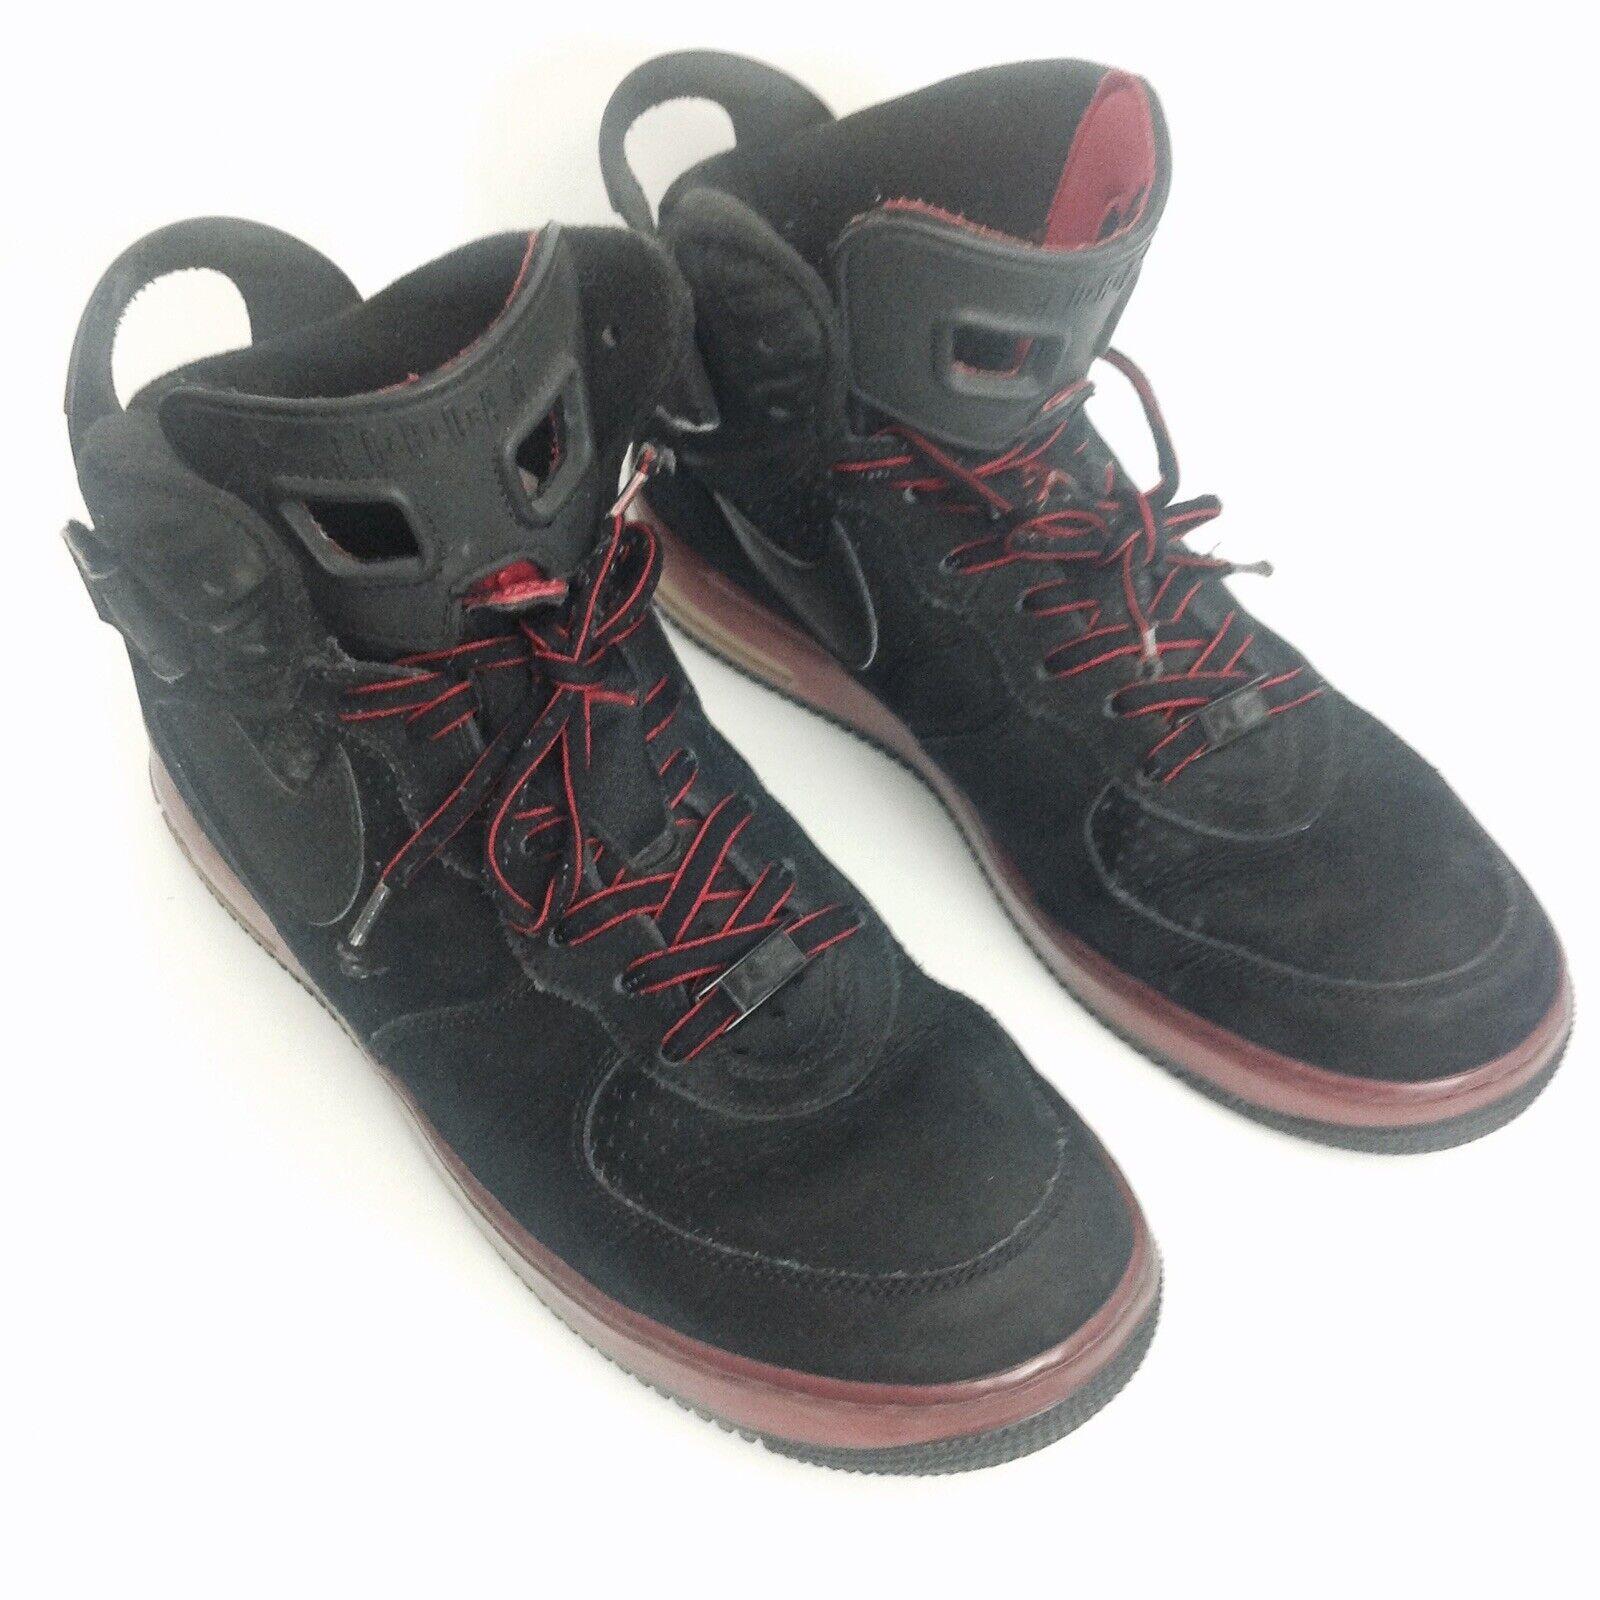 NIKE AIR JORDAN FUSION 6 BLACK VARSITY RED SUEDE SHOES 343064-062 SIZE 10.5